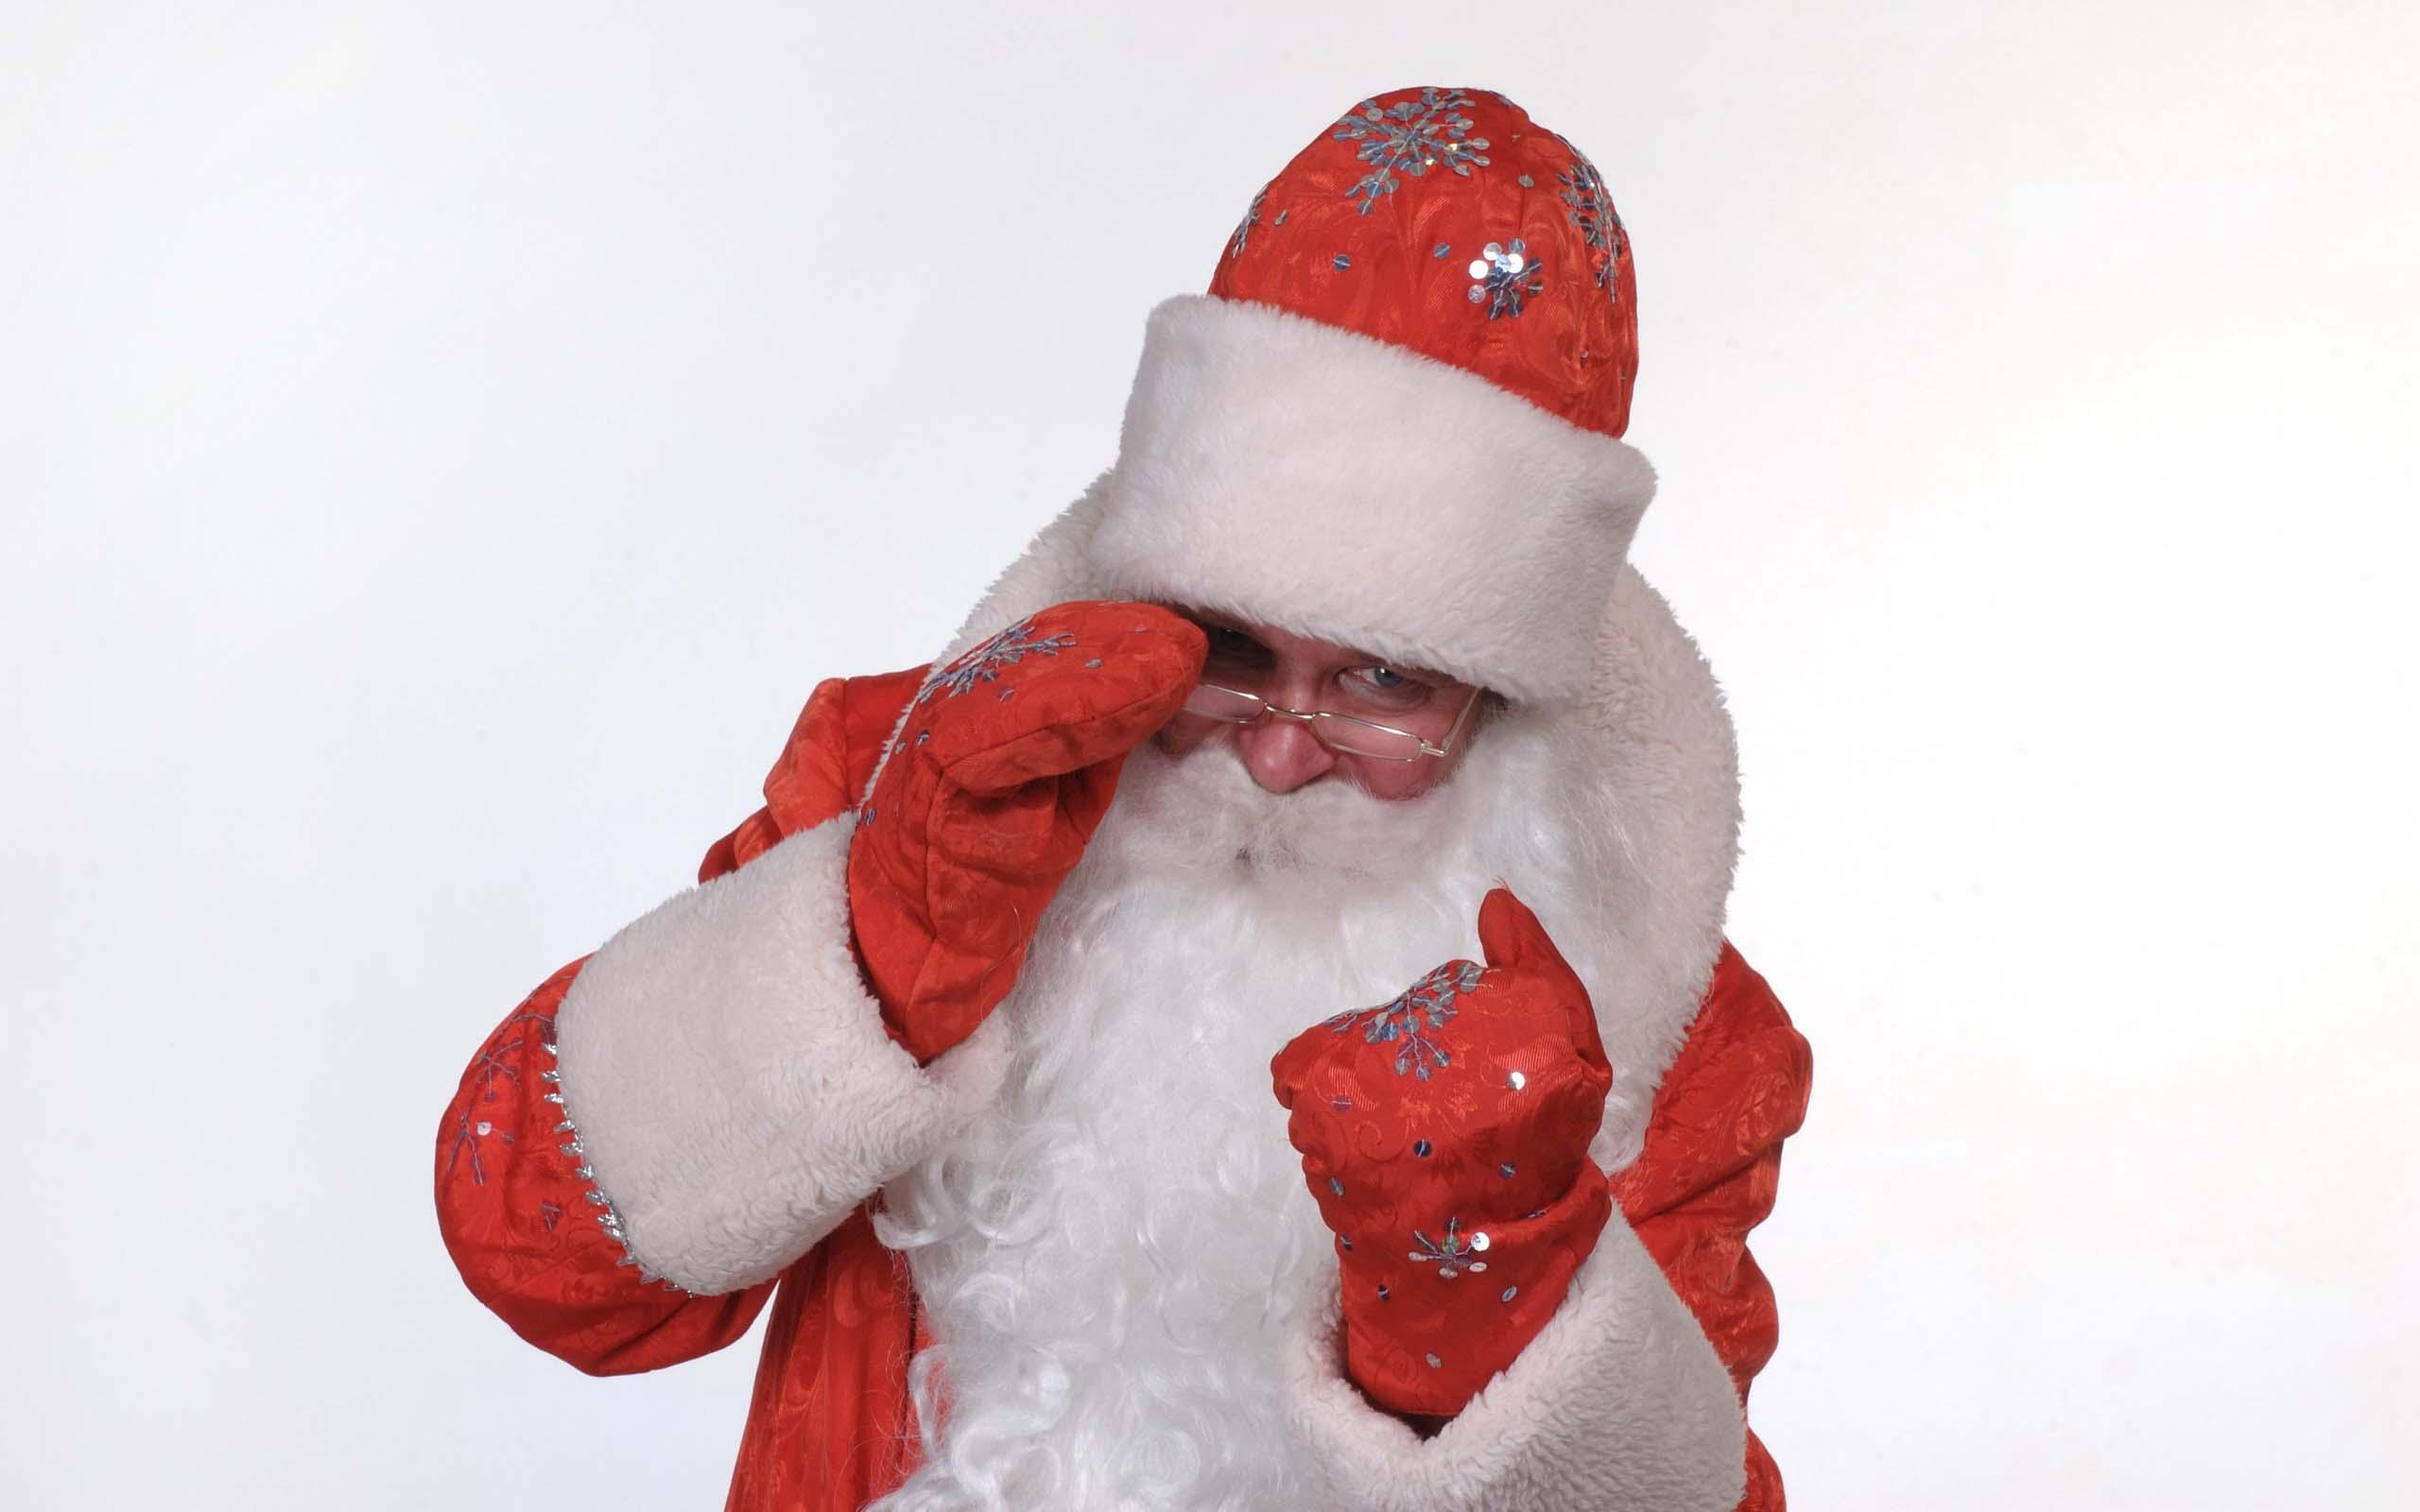 Дед мороз из великого устюга самара